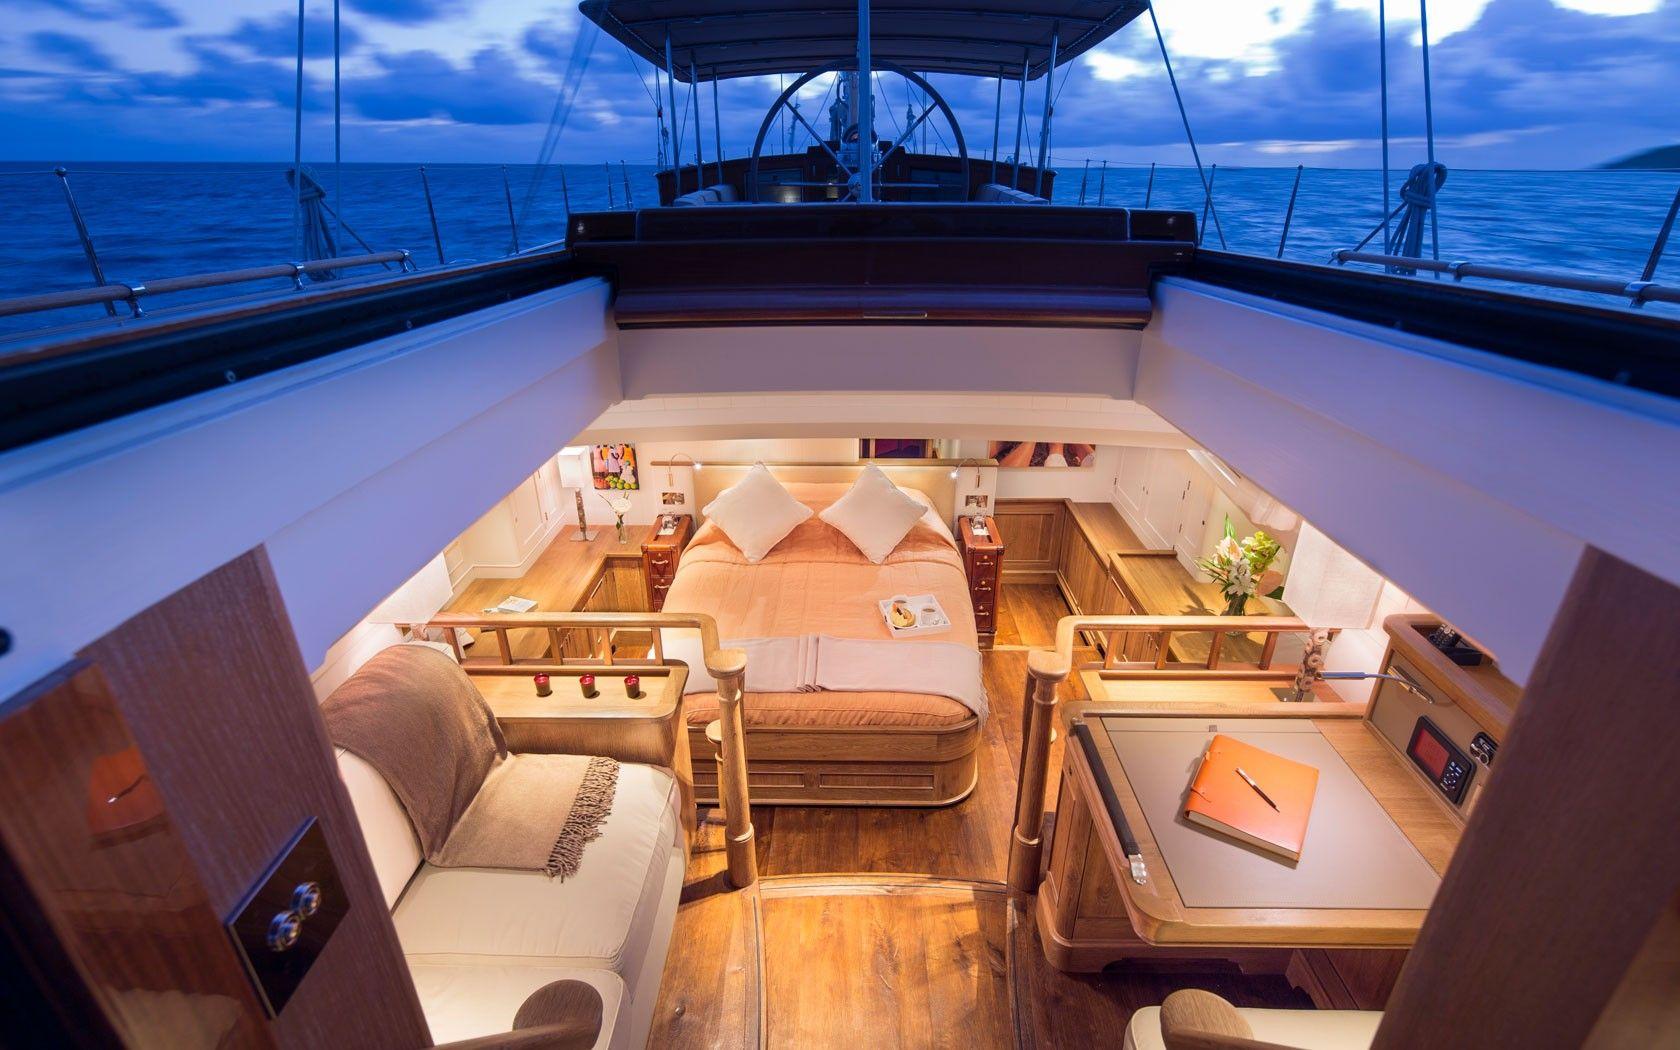 Innenarchitektur Yacht yacht pumula yachting